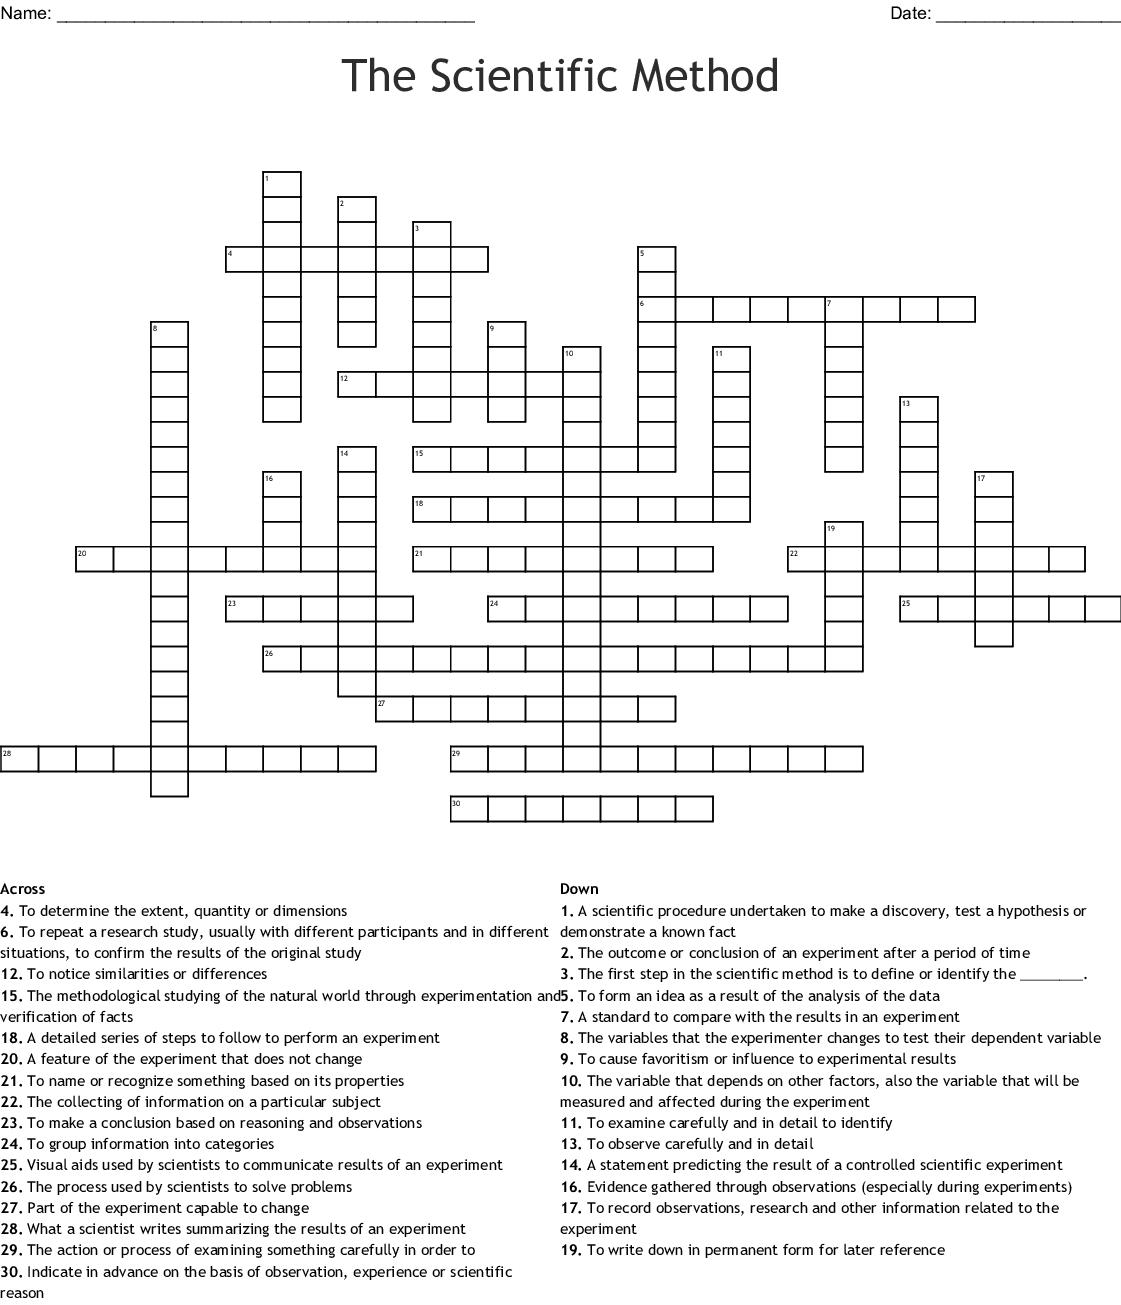 The Scientific Method Crossword